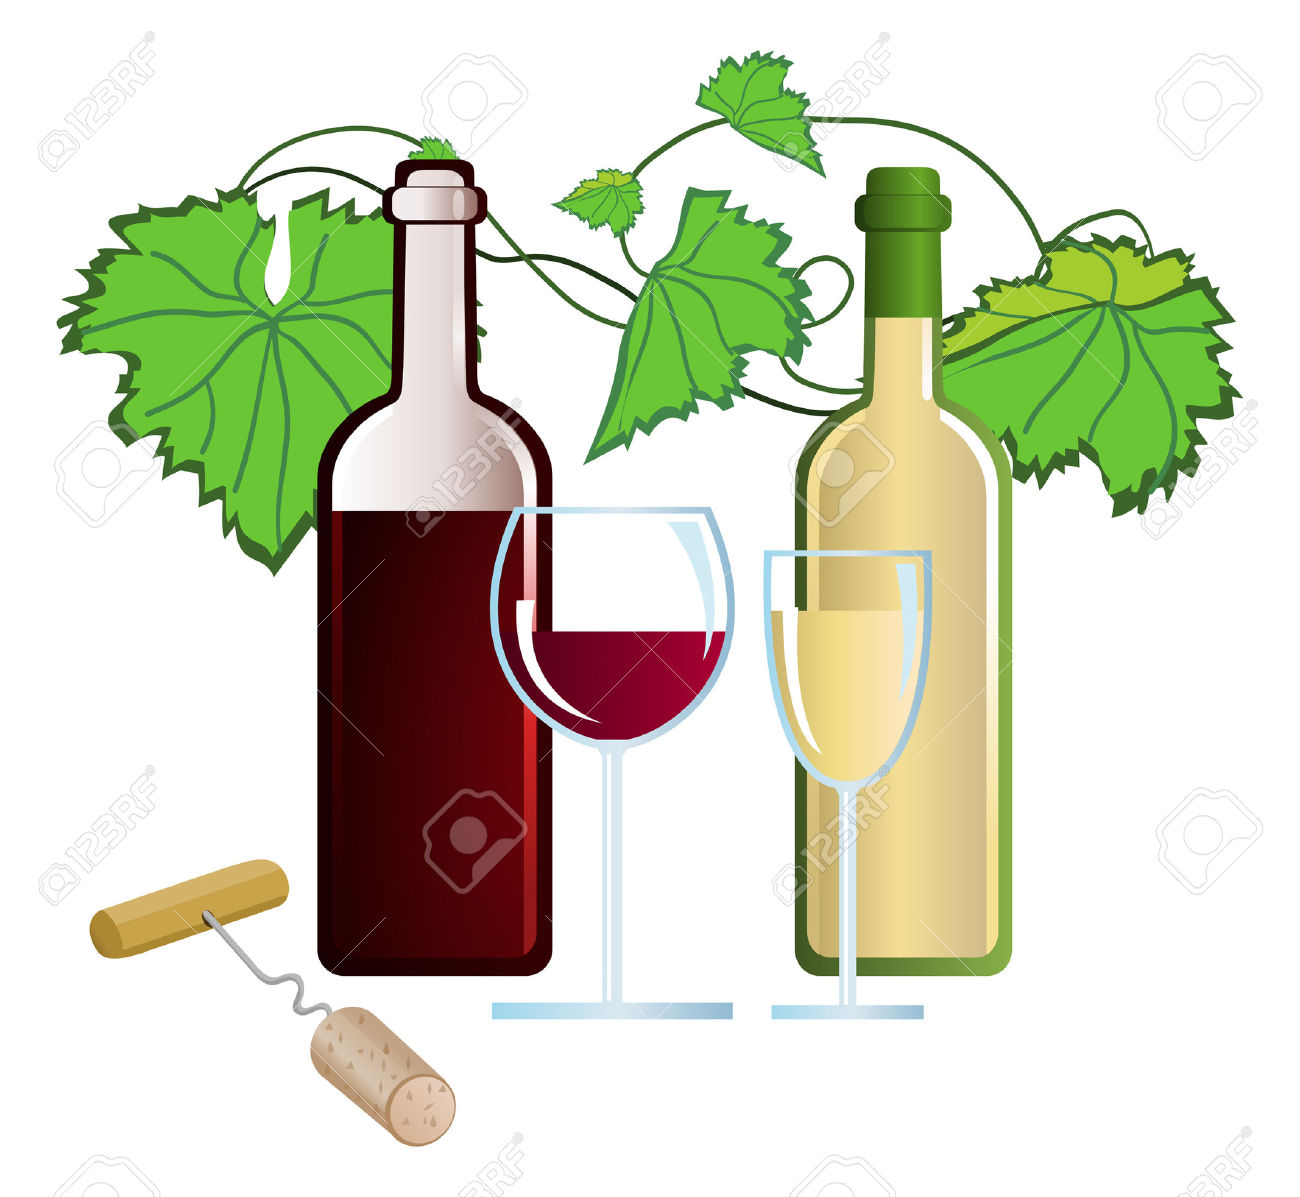 Clip-arts Of Wine And Corkscrew Stock Ve-Clip-arts of wine and corkscrew Stock Vector - 5288191-3